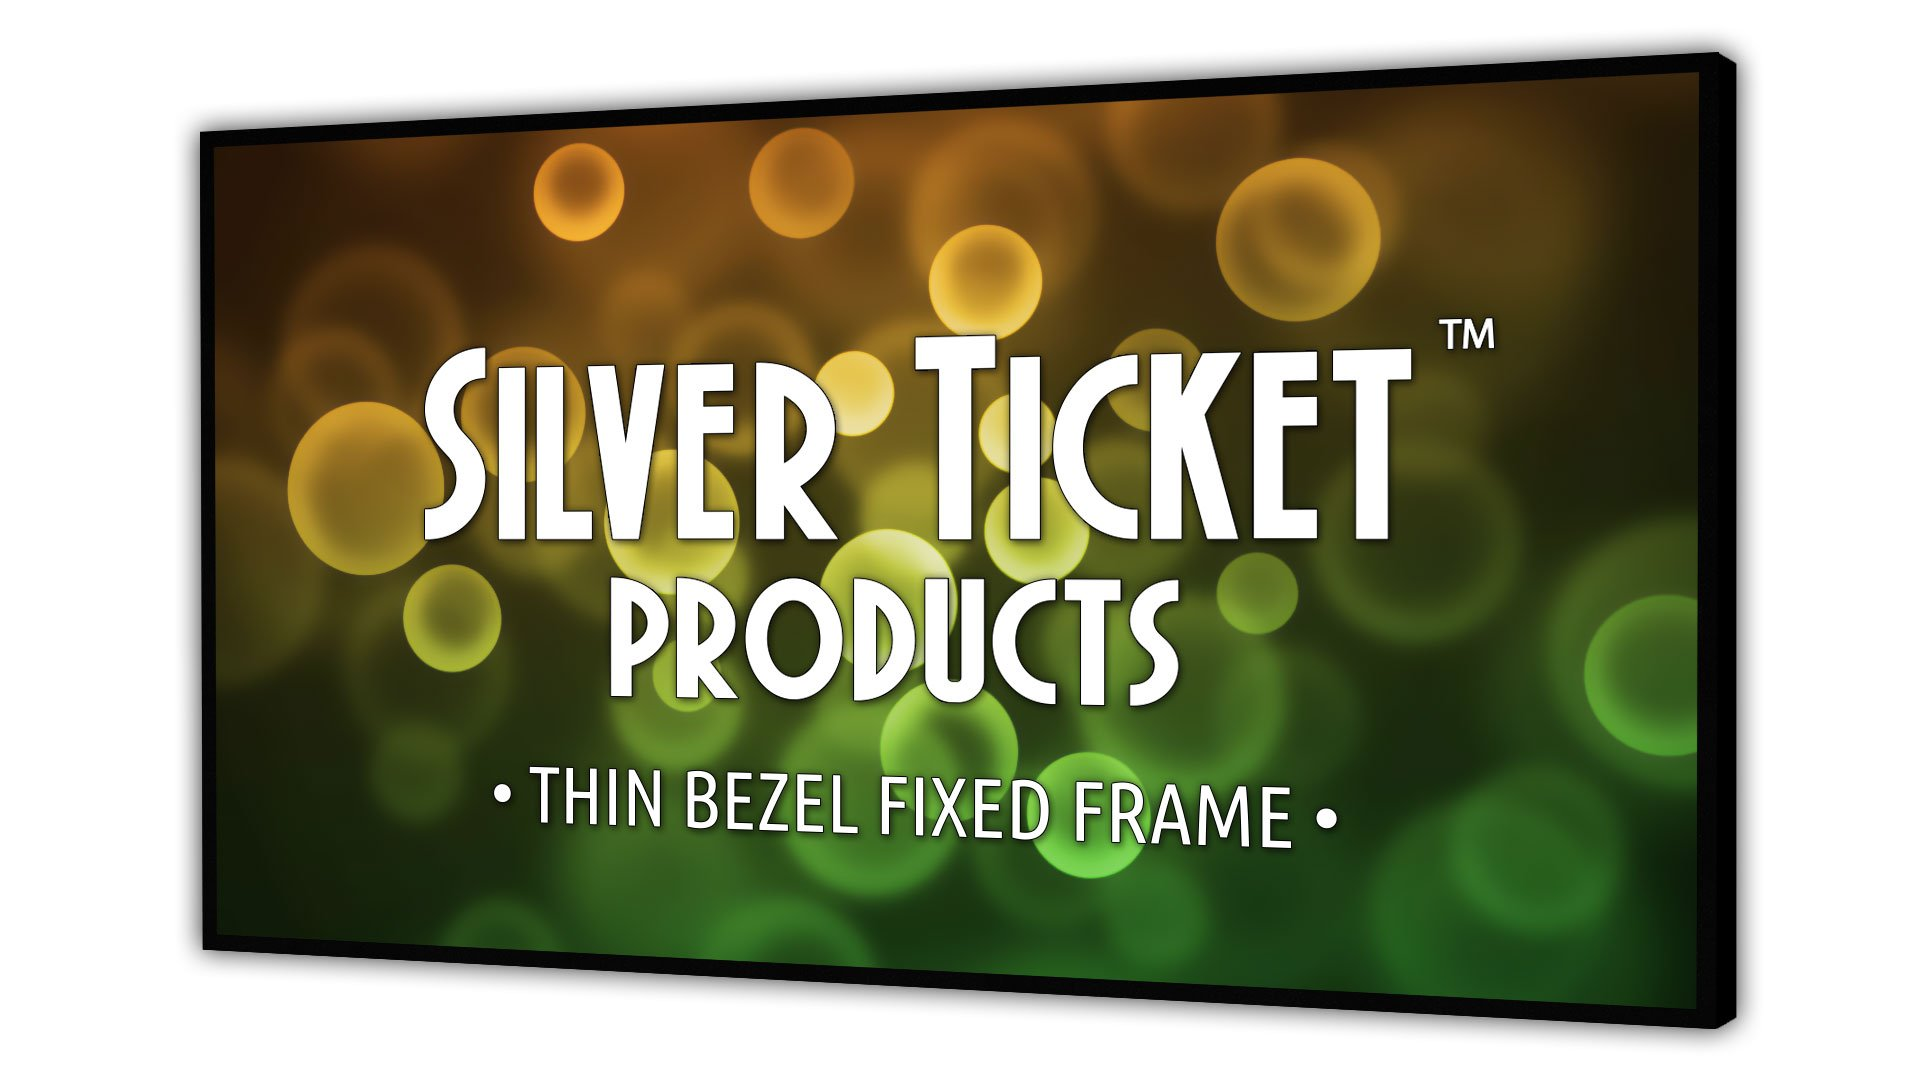 STT-169110 Silver Ticket Thin Bezel 16:9 Aspect Ratio 4K Ultra HD Ready HDTV (6 Piece Fixed Frame) Projector Screen (16:9, 110'', White Material)